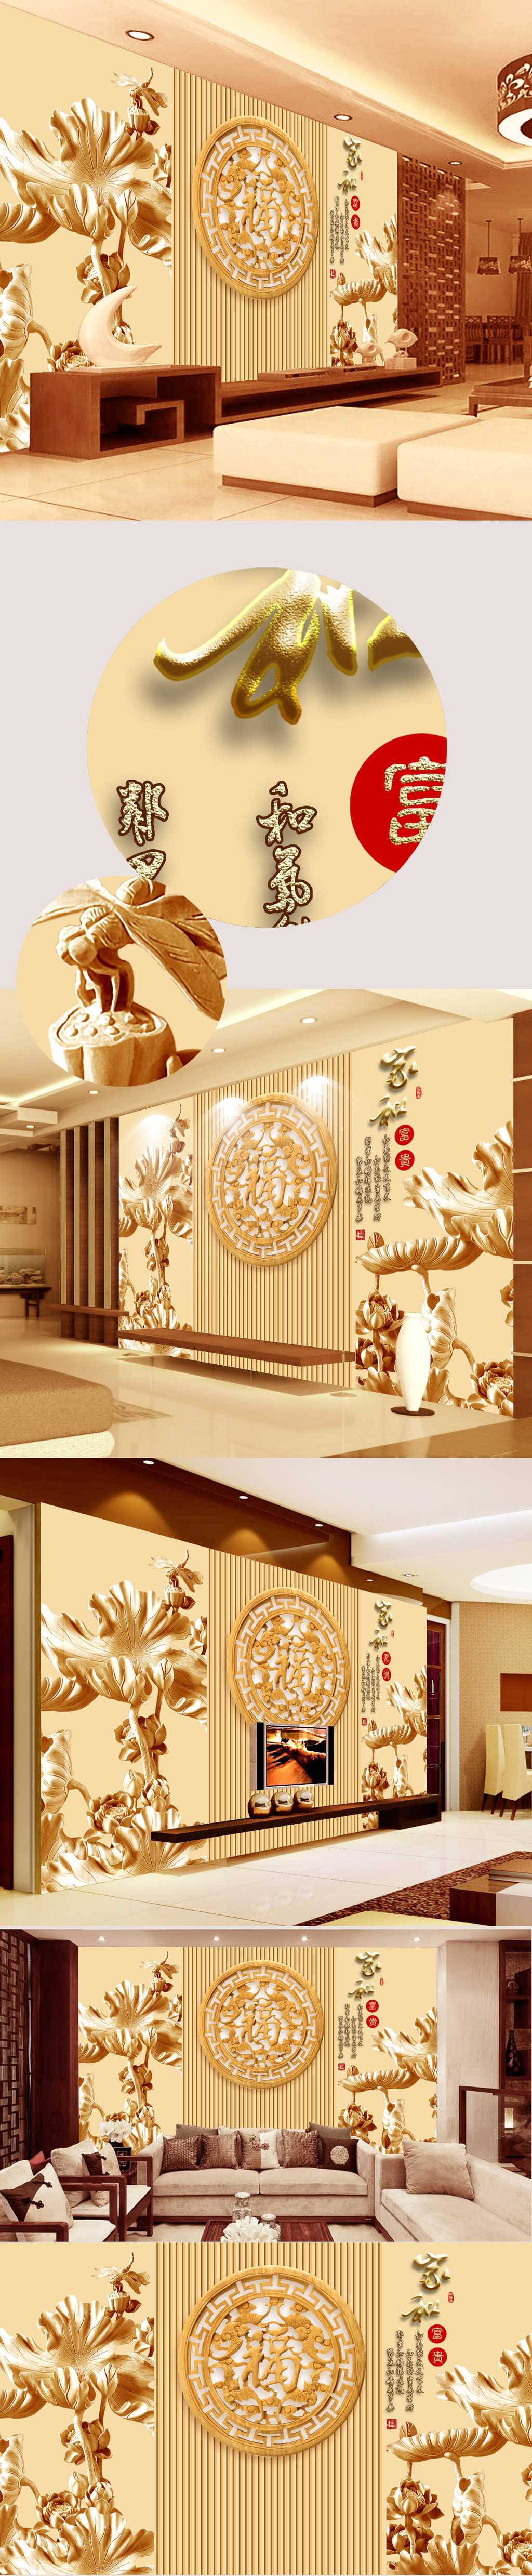 3d木雕家和富贵客厅背景墙